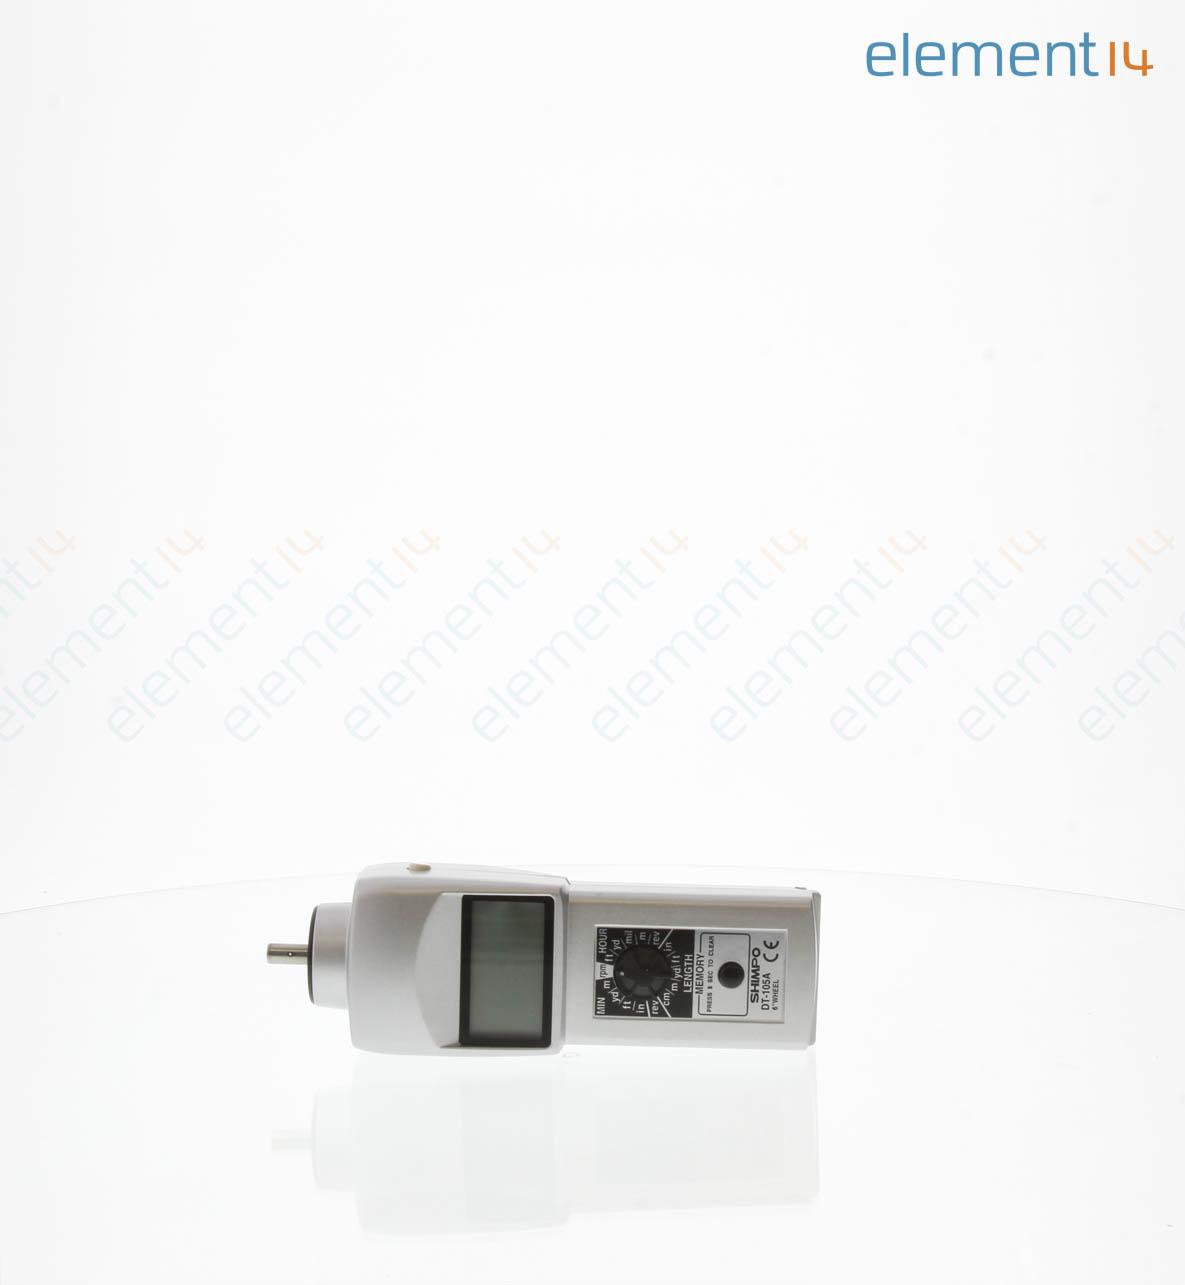 Dt 105a Shimpo Instruments Tachometer 01rpm To 25000rpm 0006 Led Rpm Meter Circuit Diagram An Stroboscope Add Compare